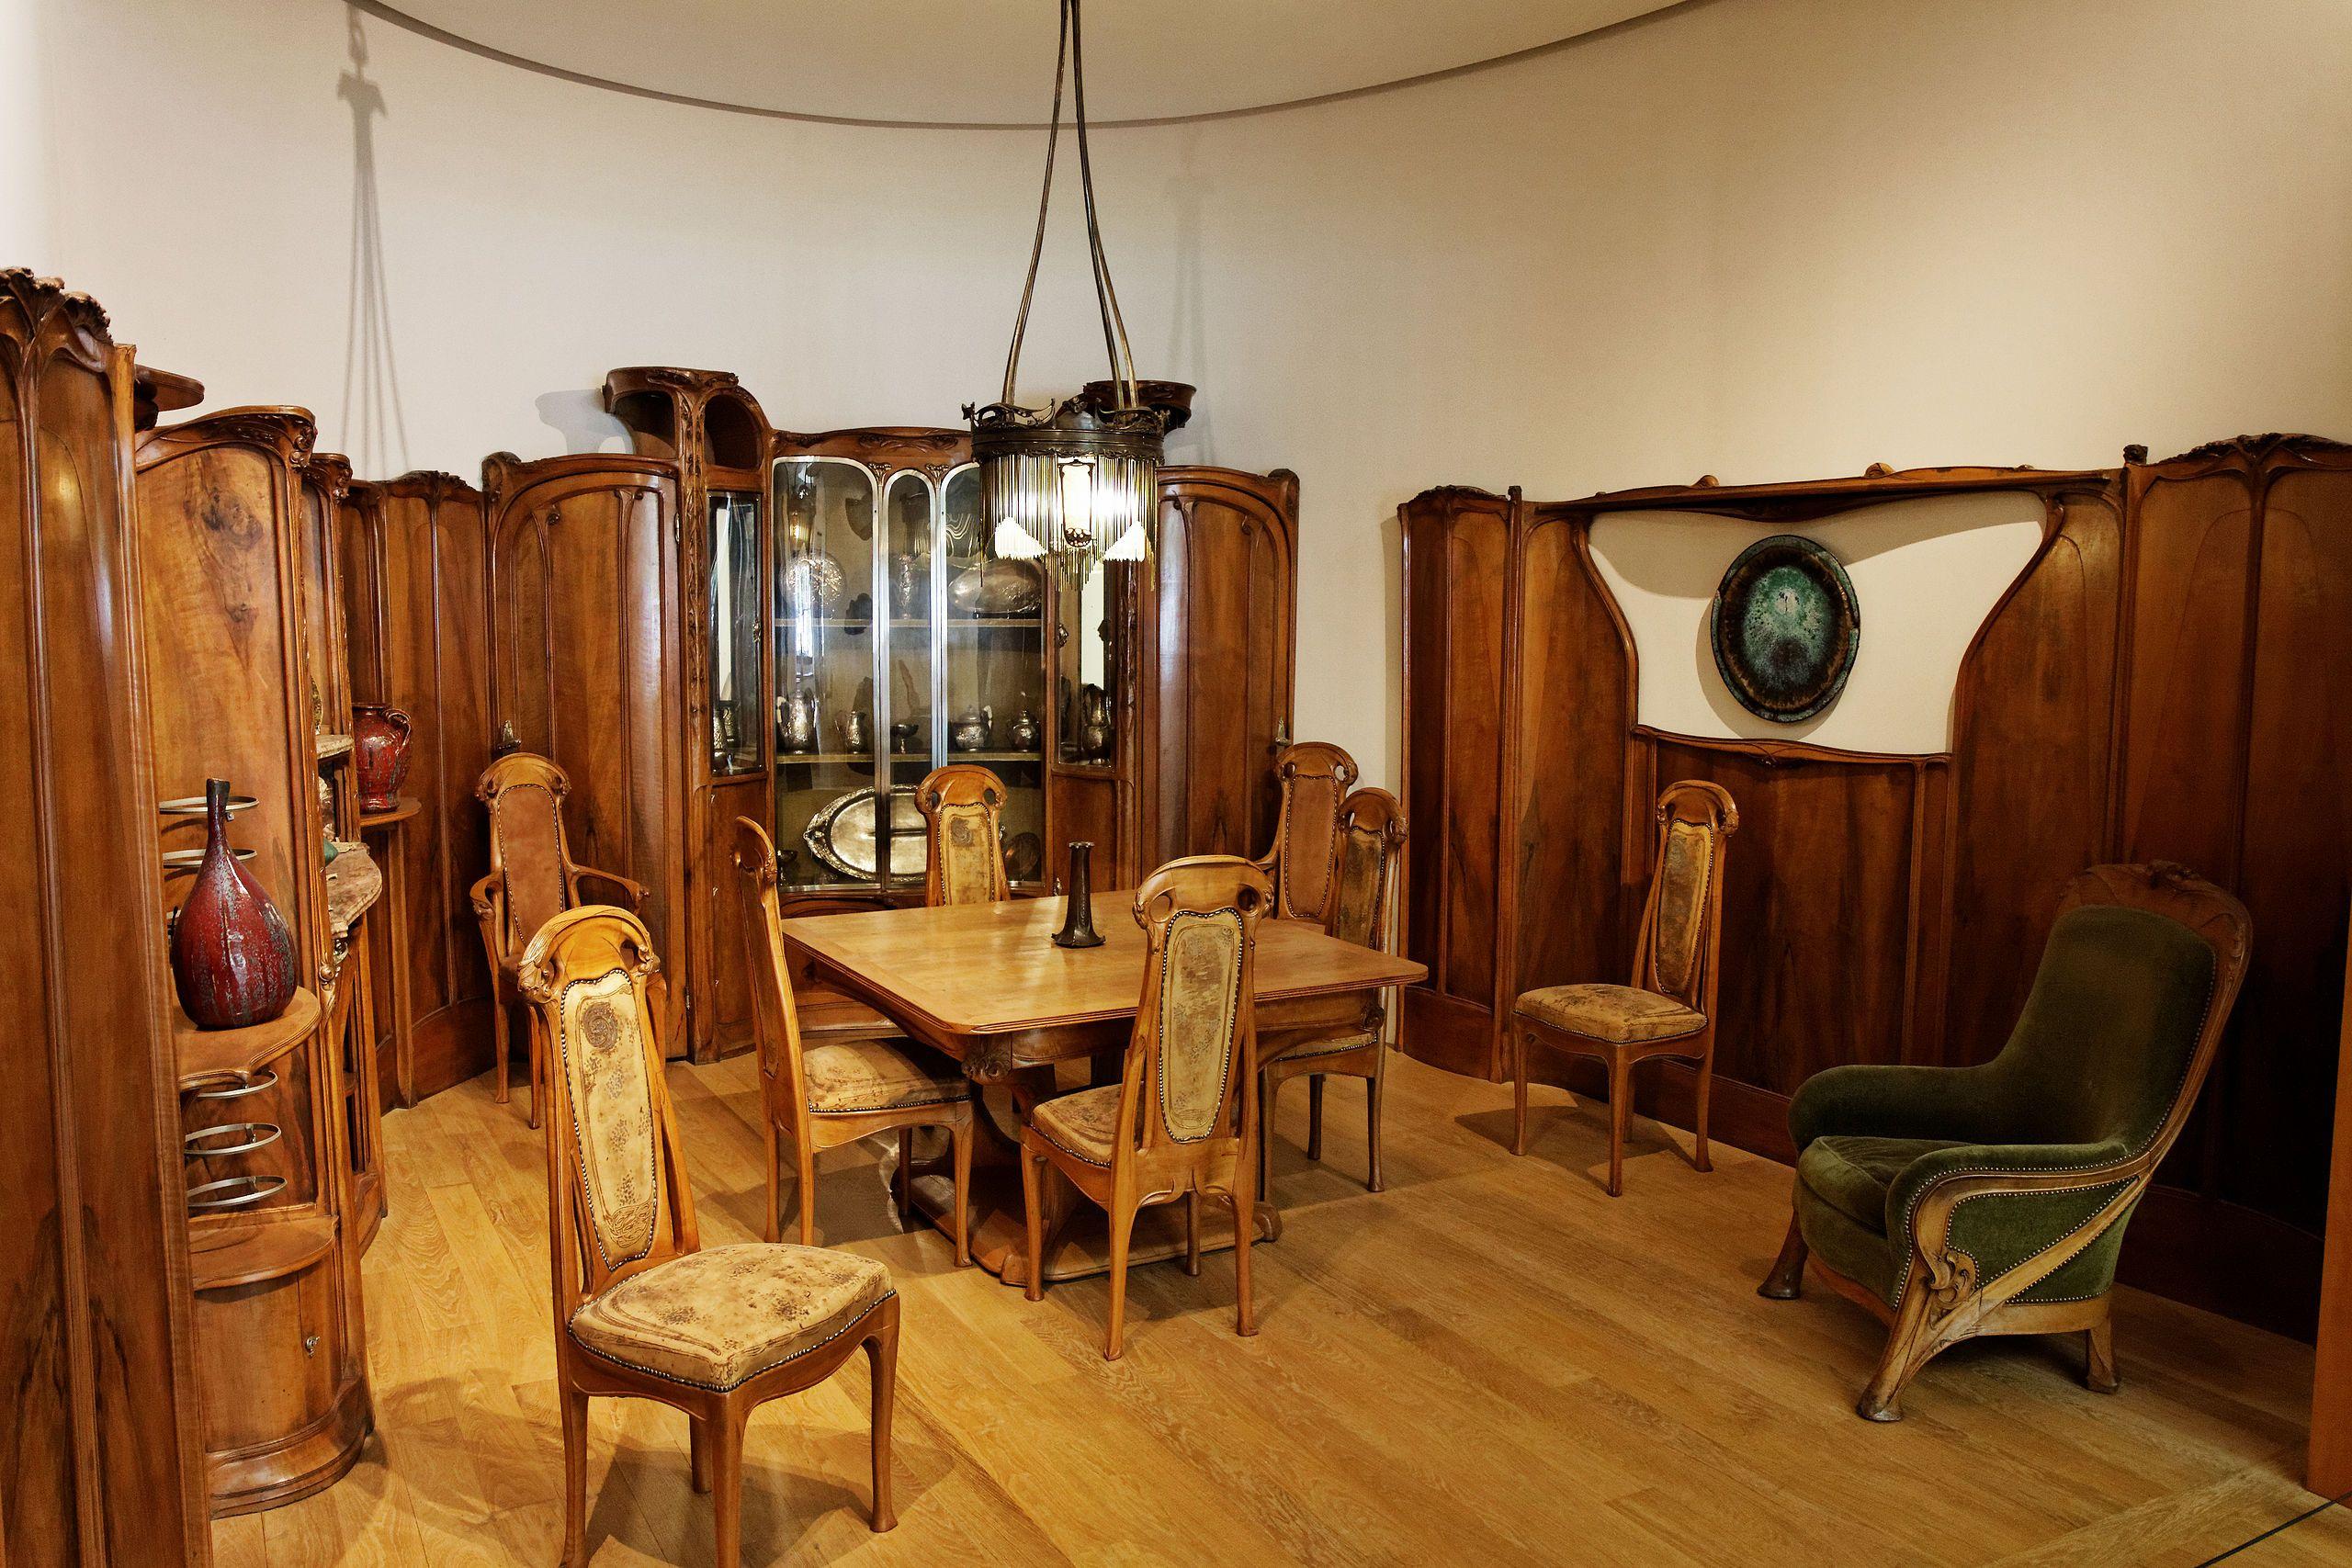 Petit Palais - Salle à manger Maison Guimard - 002 - Hector Guimard - Wikipedia, the free encyclopedia